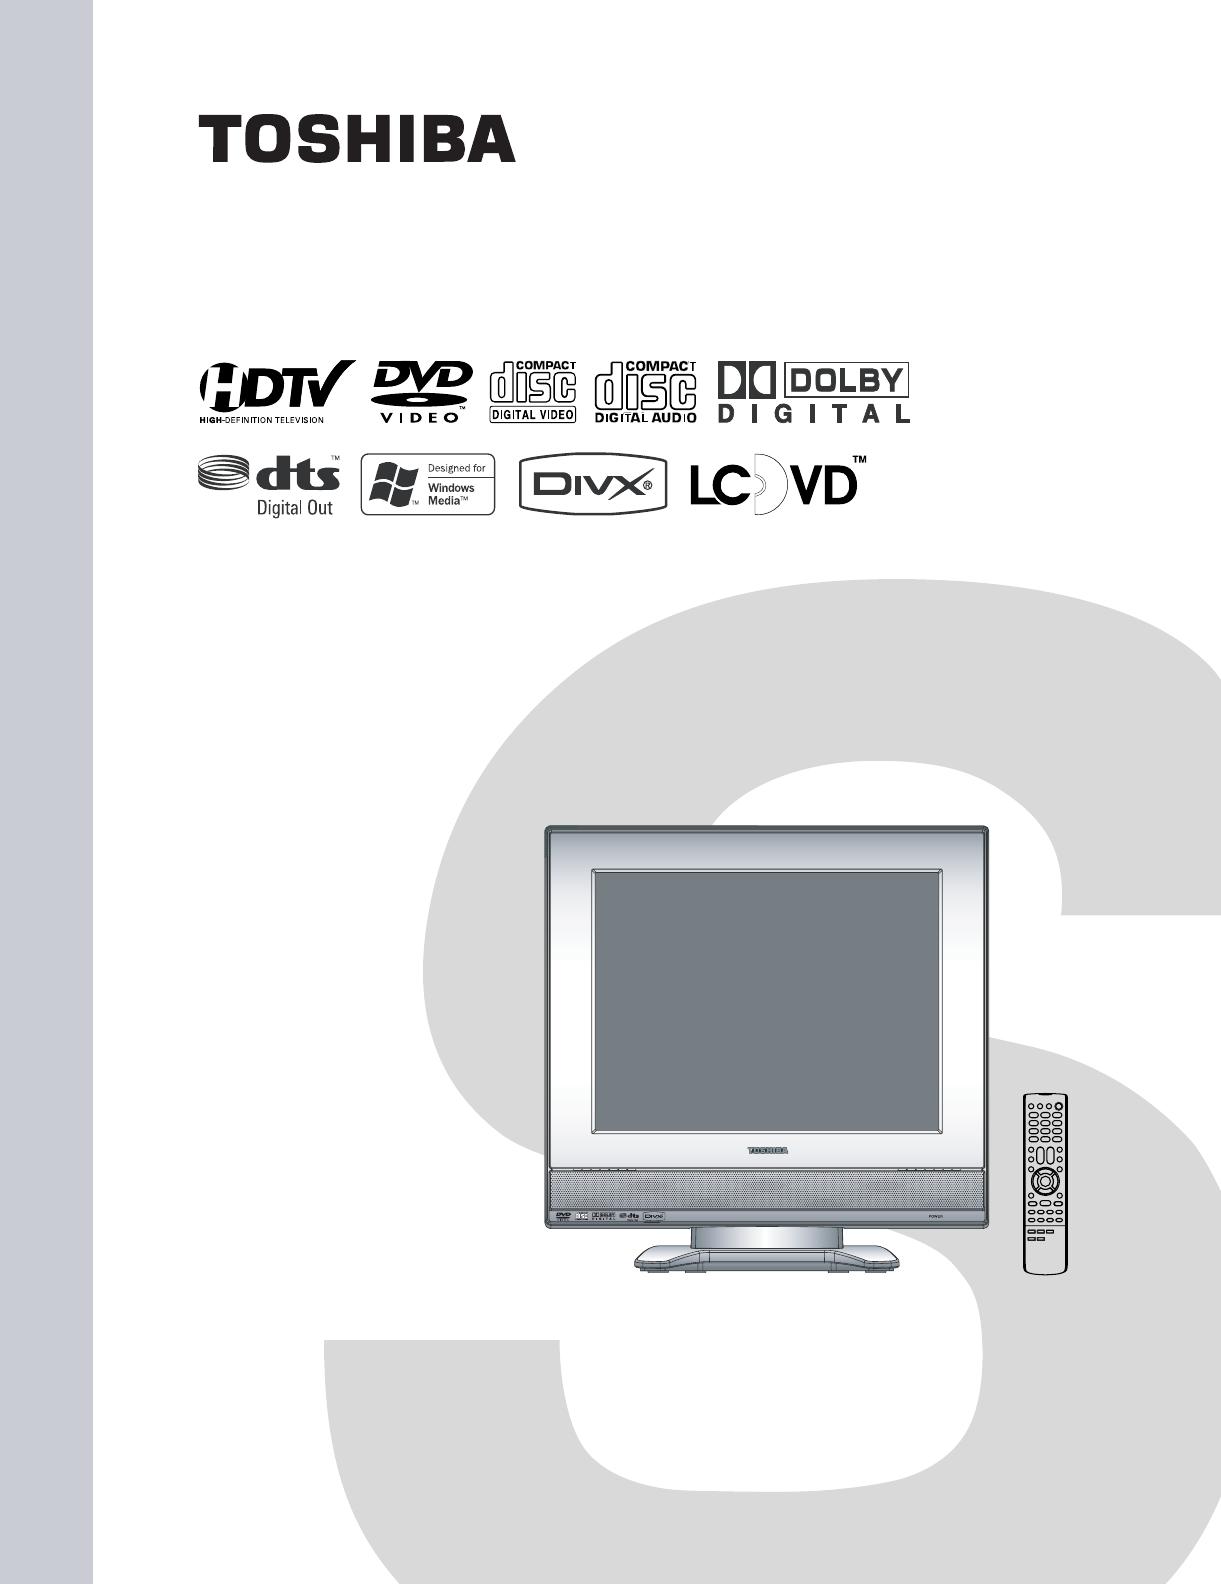 19hlv87 Toshiba Lcd Tv Dvd Svm Buy Printed Circuit Boardatsc Smart Board